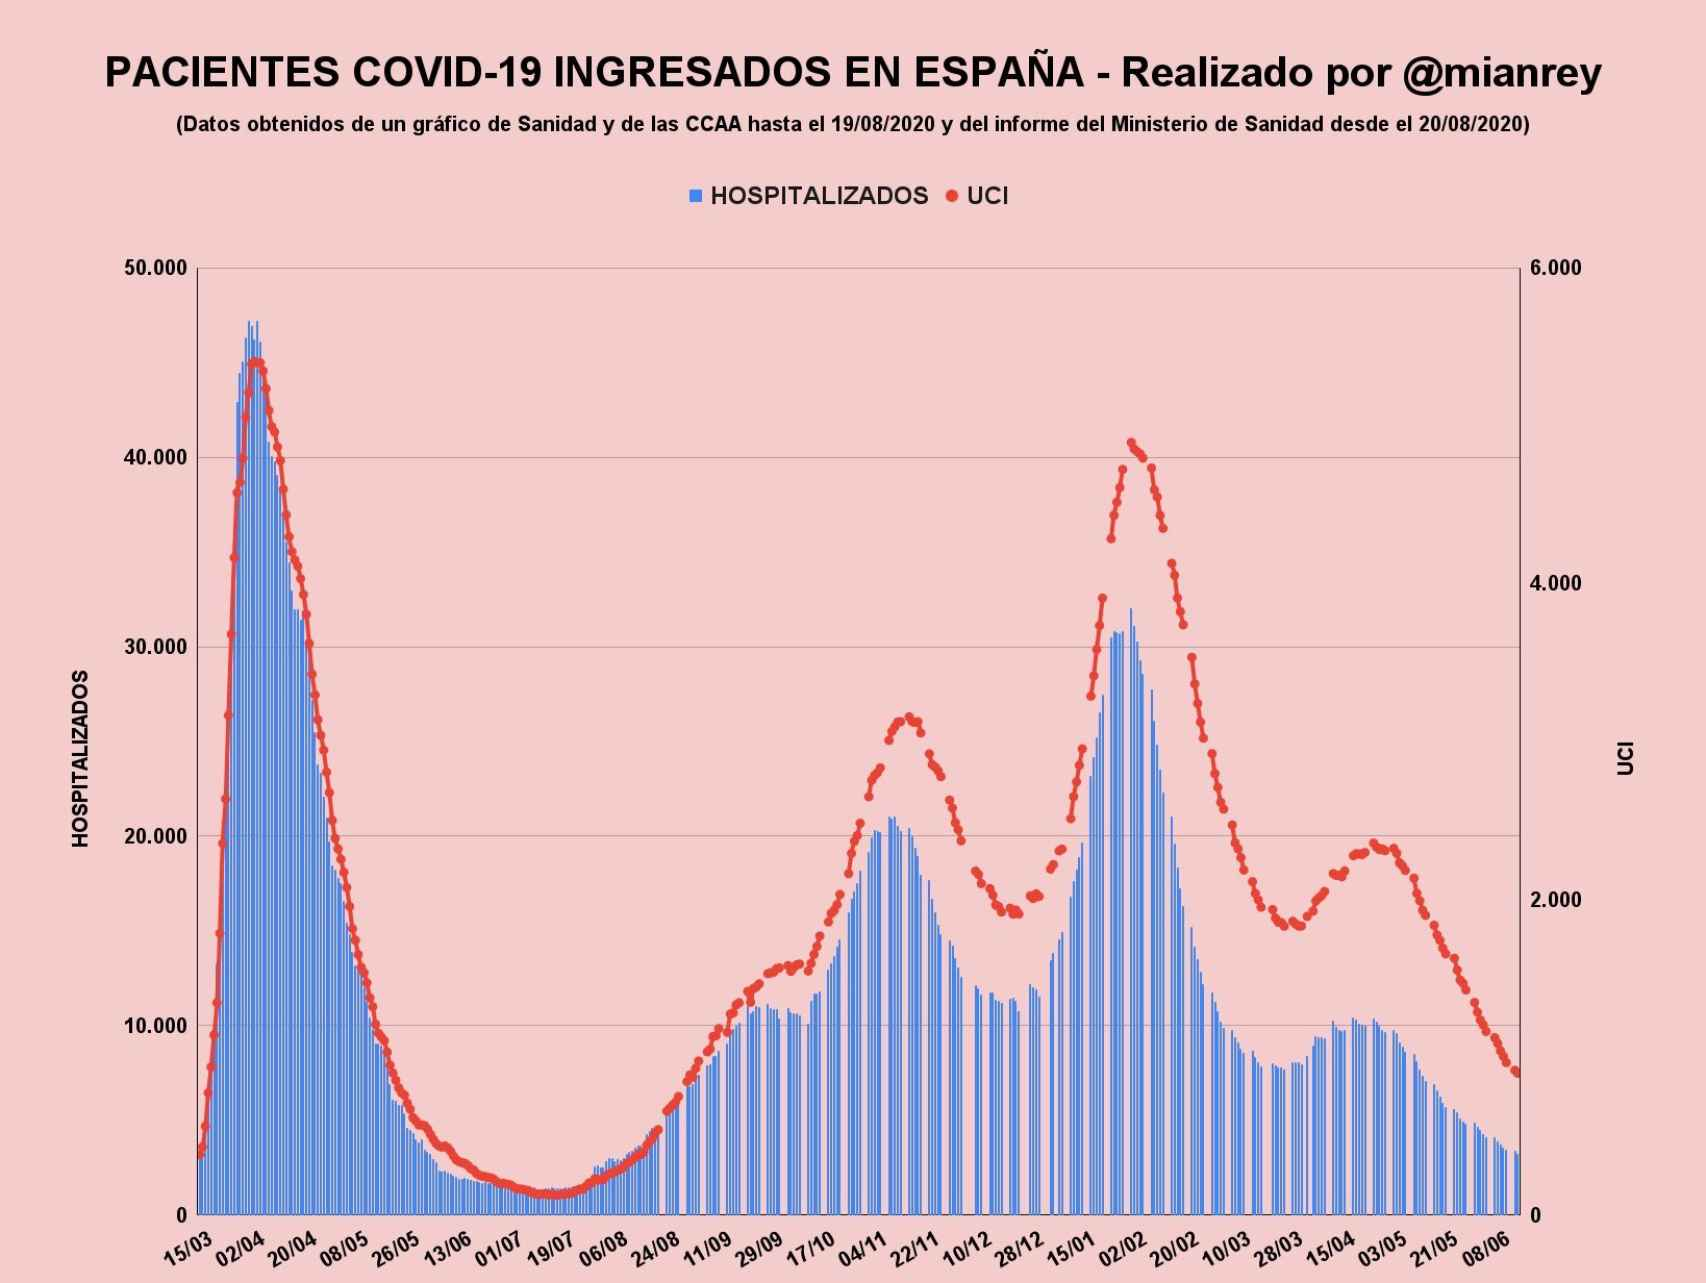 Evolución de la hospitalización en España